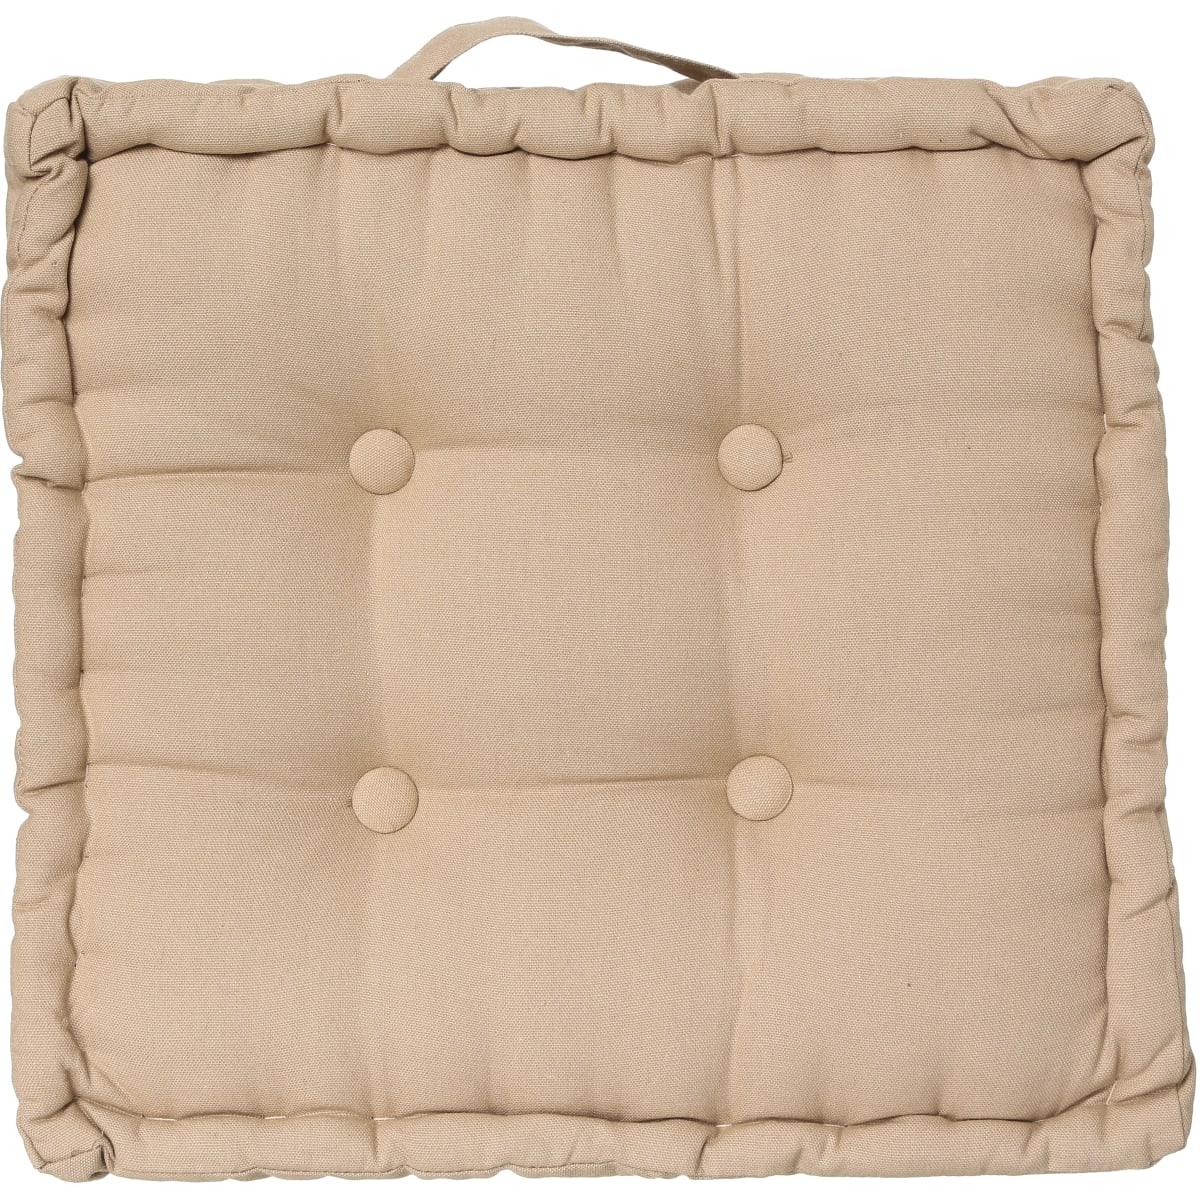 Подушка напольная 40x40 цвет бежевый